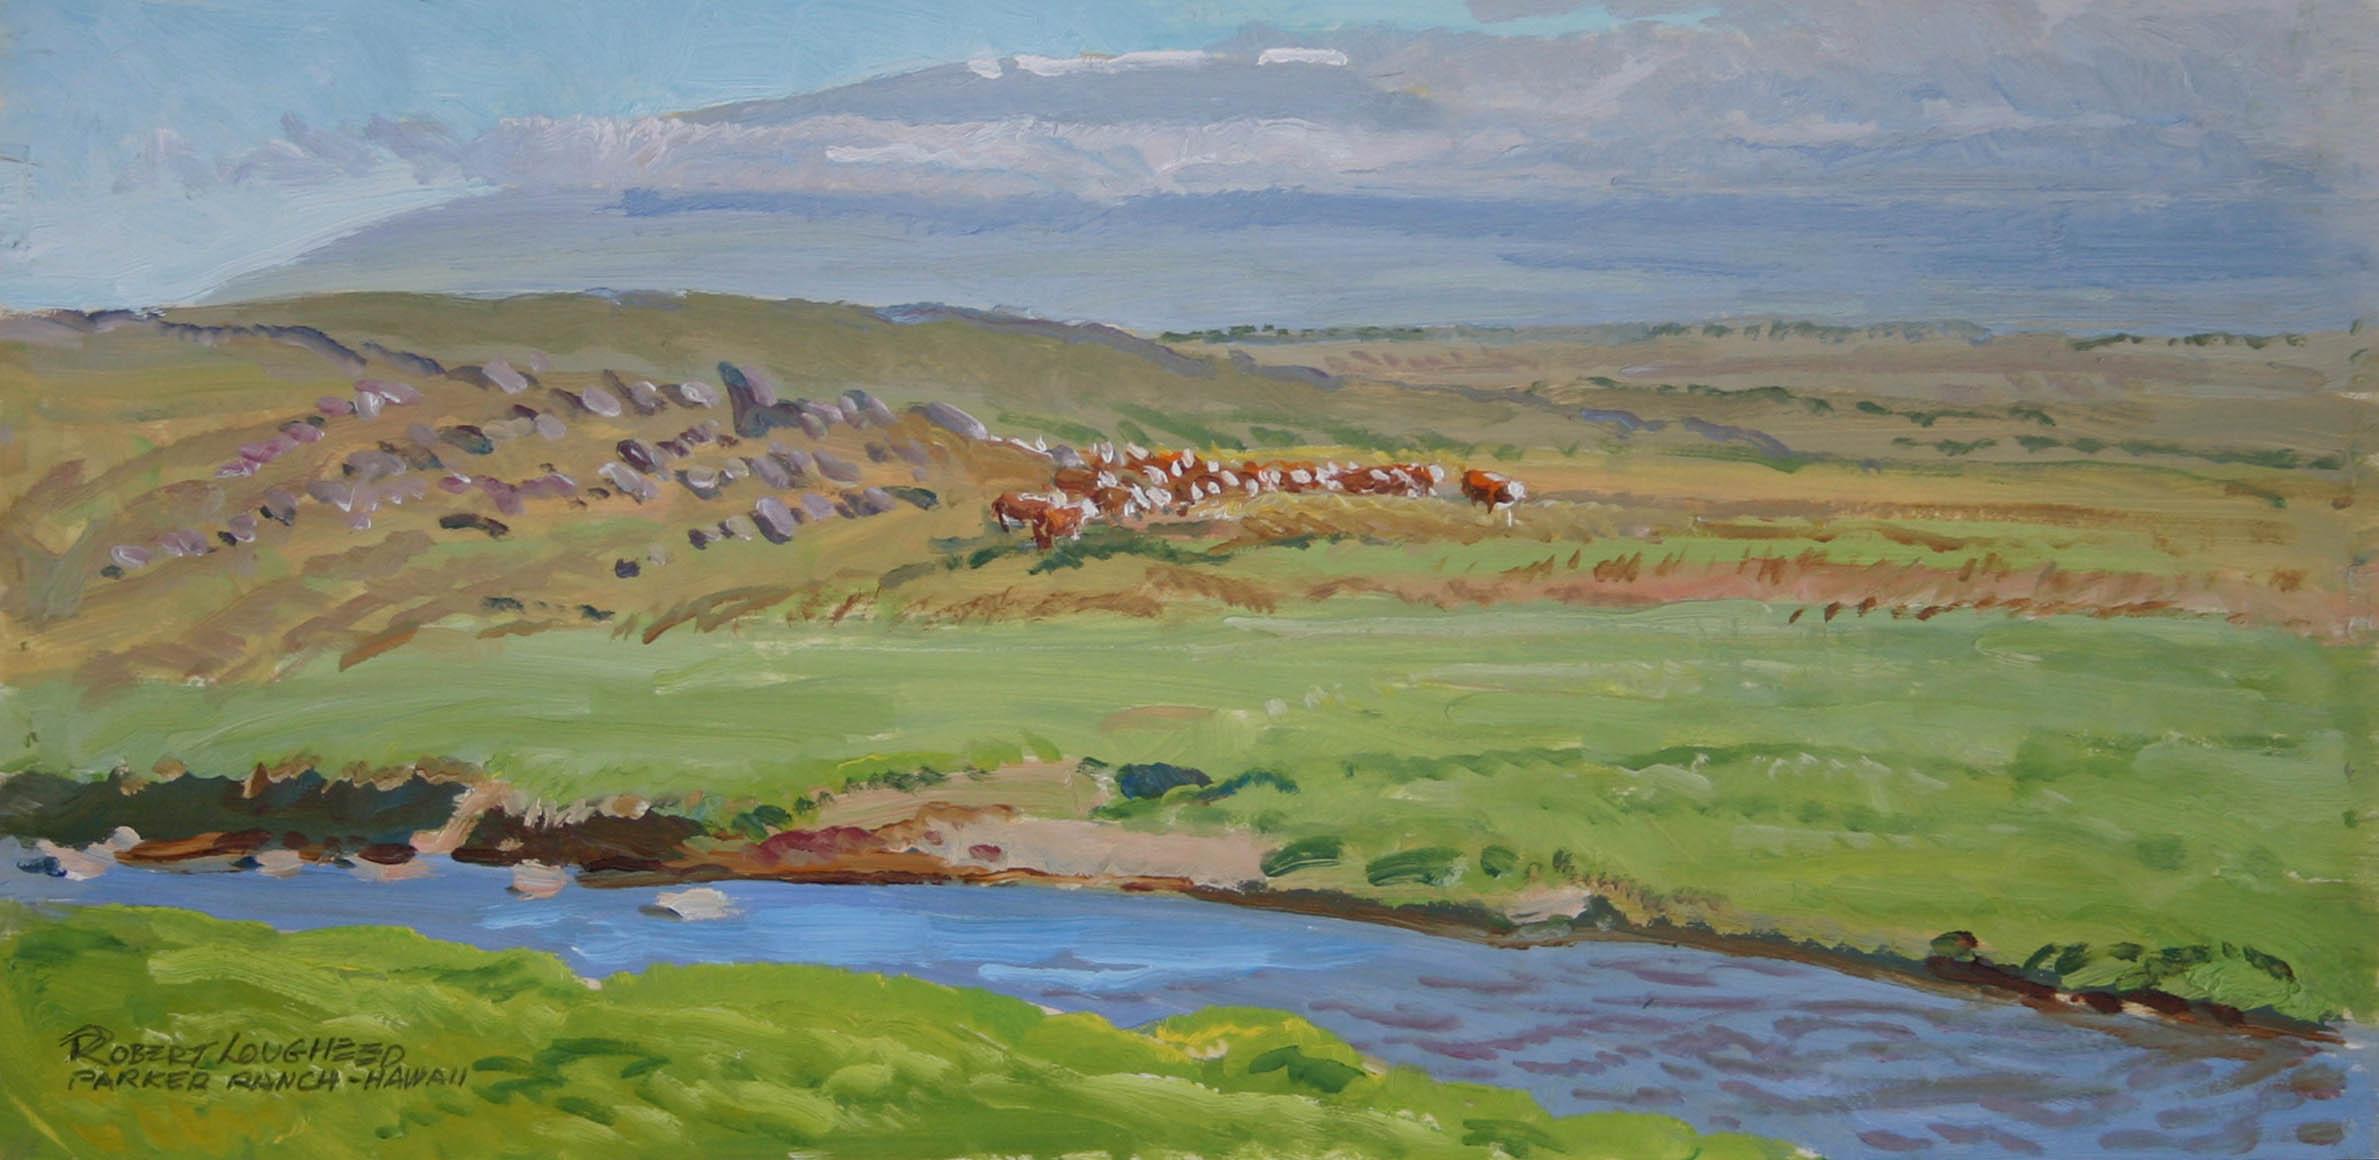 Stream on Parker Ranch by  Robert Lougheed - Masterpiece Online